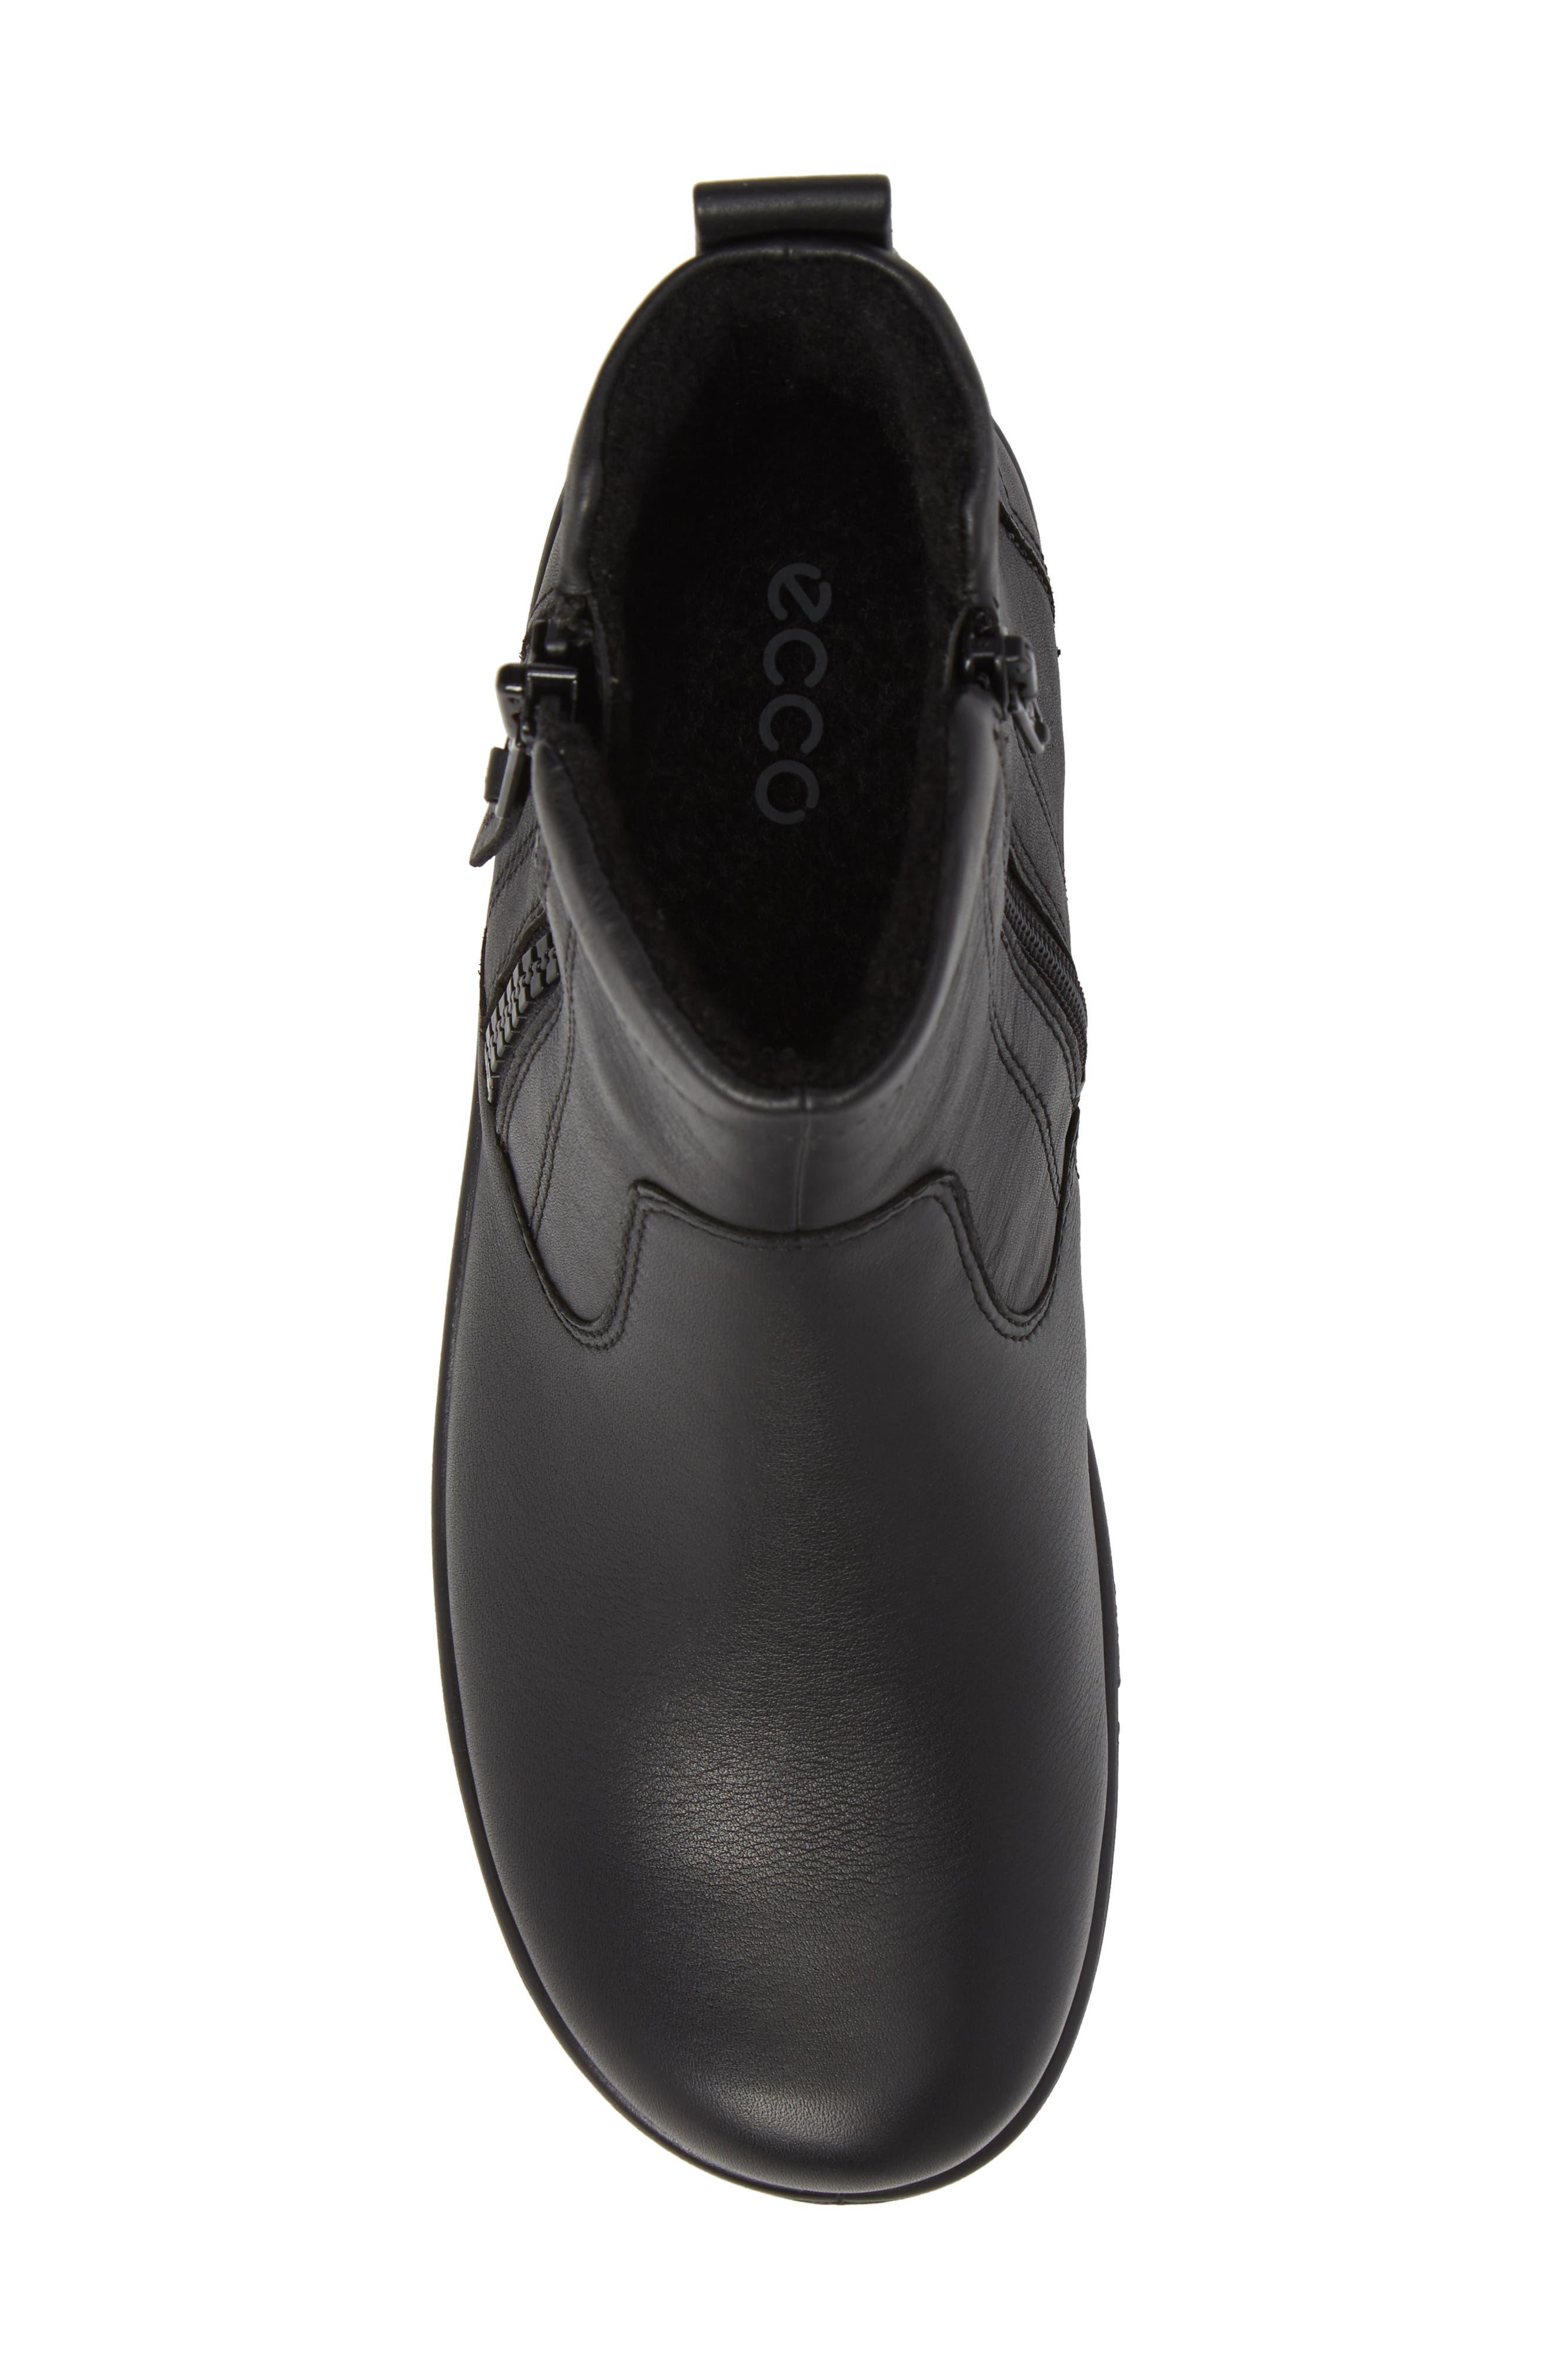 Babett Gore-Tex<sup>®</sup> Bootie,                             Alternate thumbnail 5, color,                             Black Leather